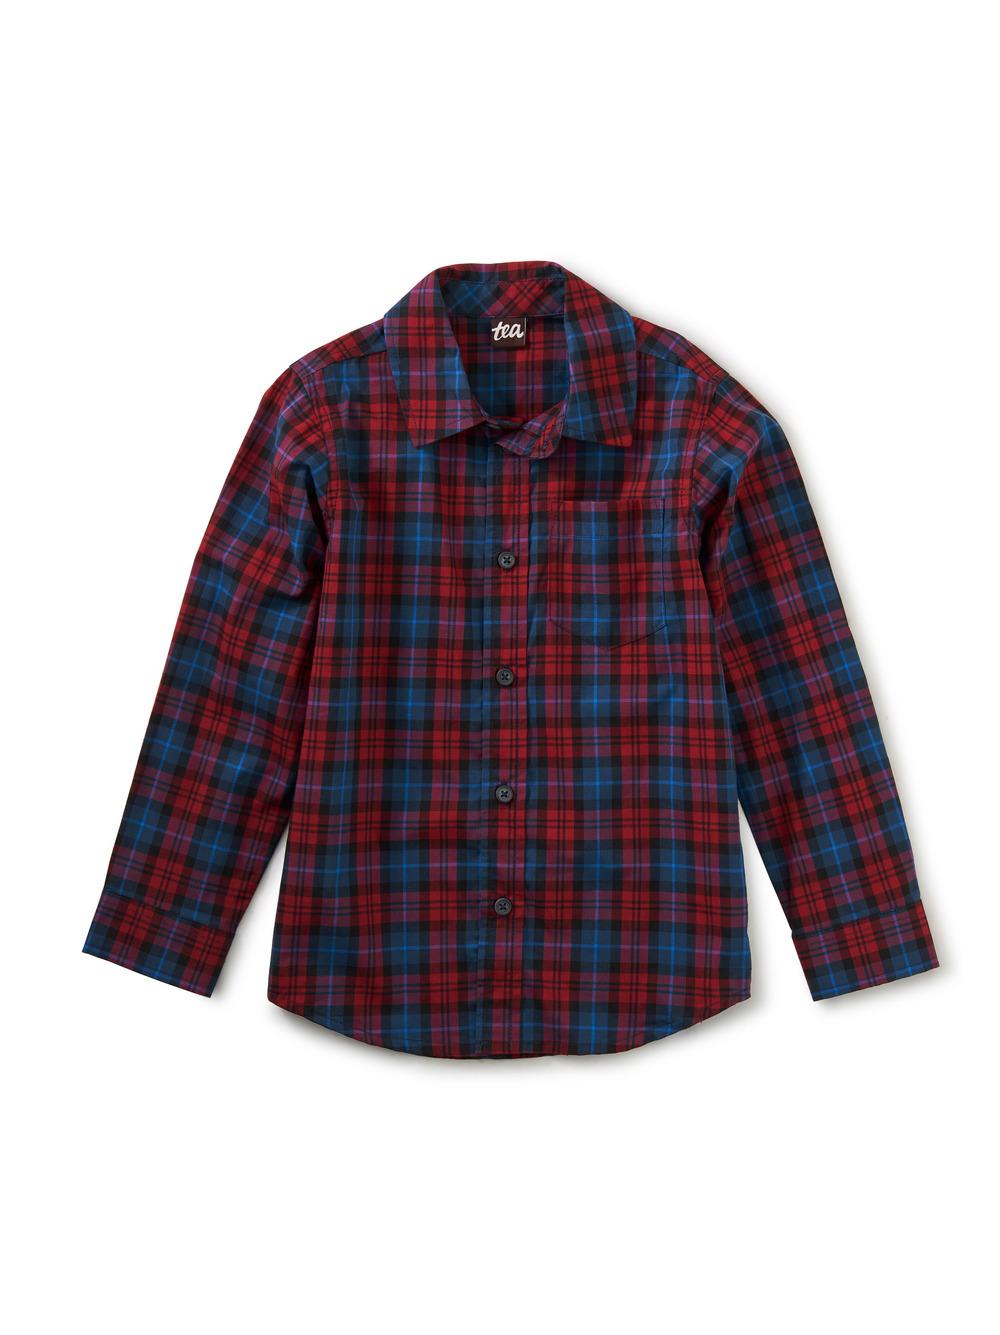 Family Plaid Button Up Shirt